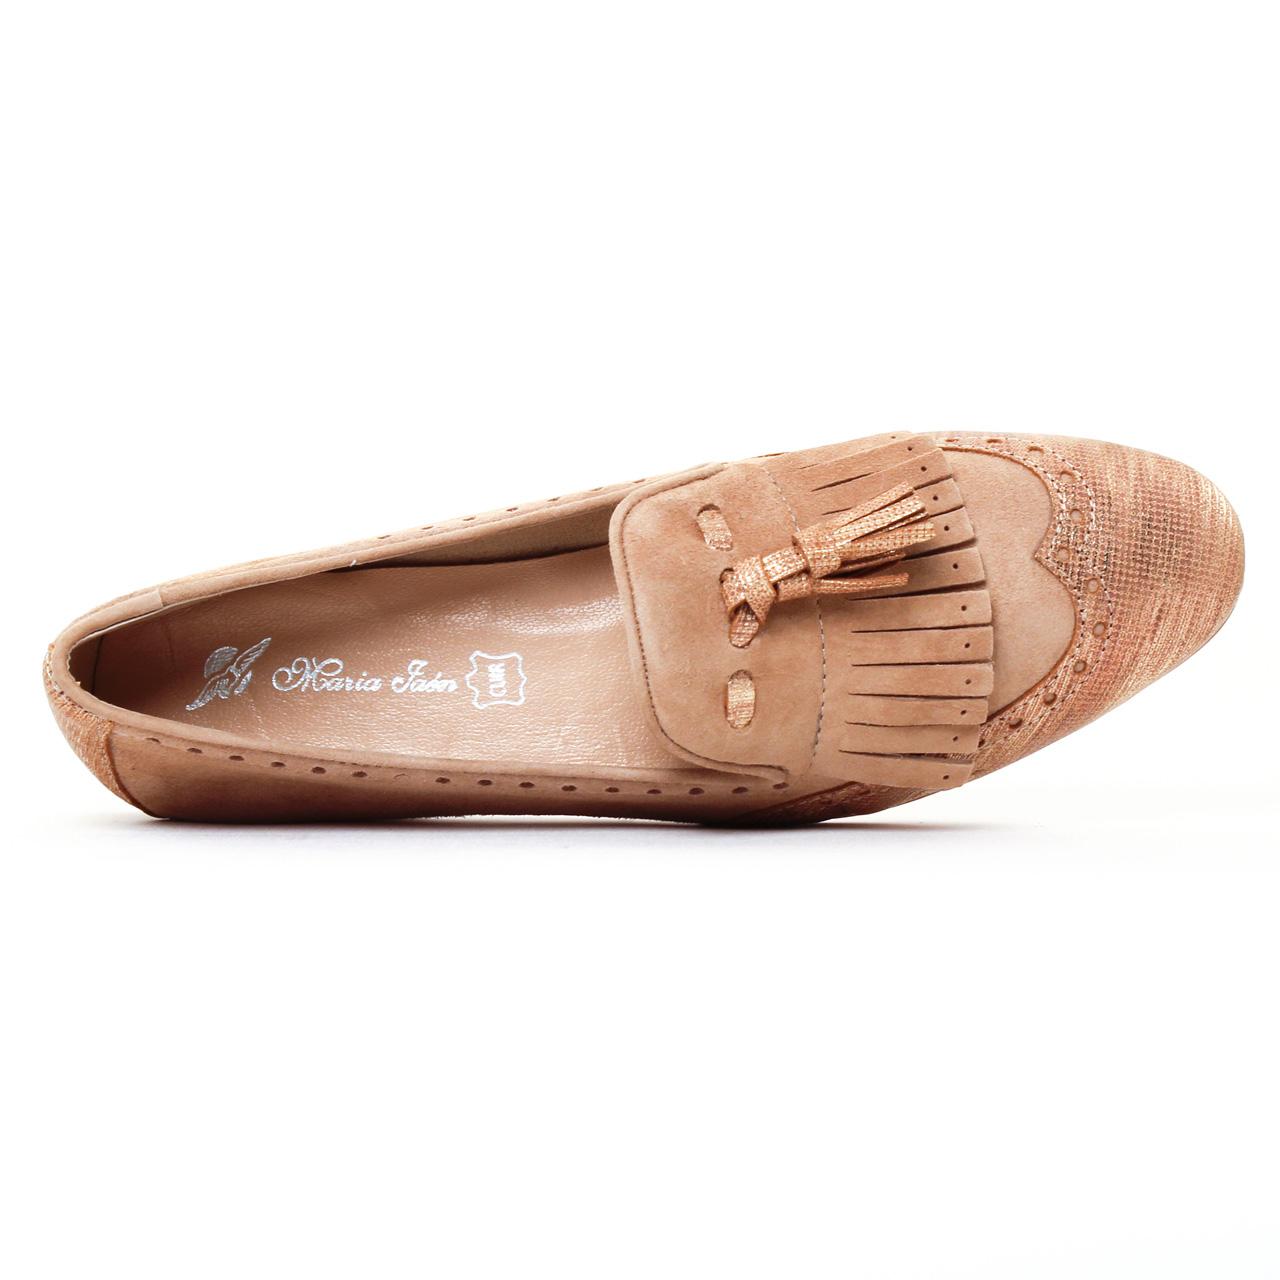 maria jaen 4067 n taupe mocassin slippers beige dor printemps t chez trois par 3. Black Bedroom Furniture Sets. Home Design Ideas